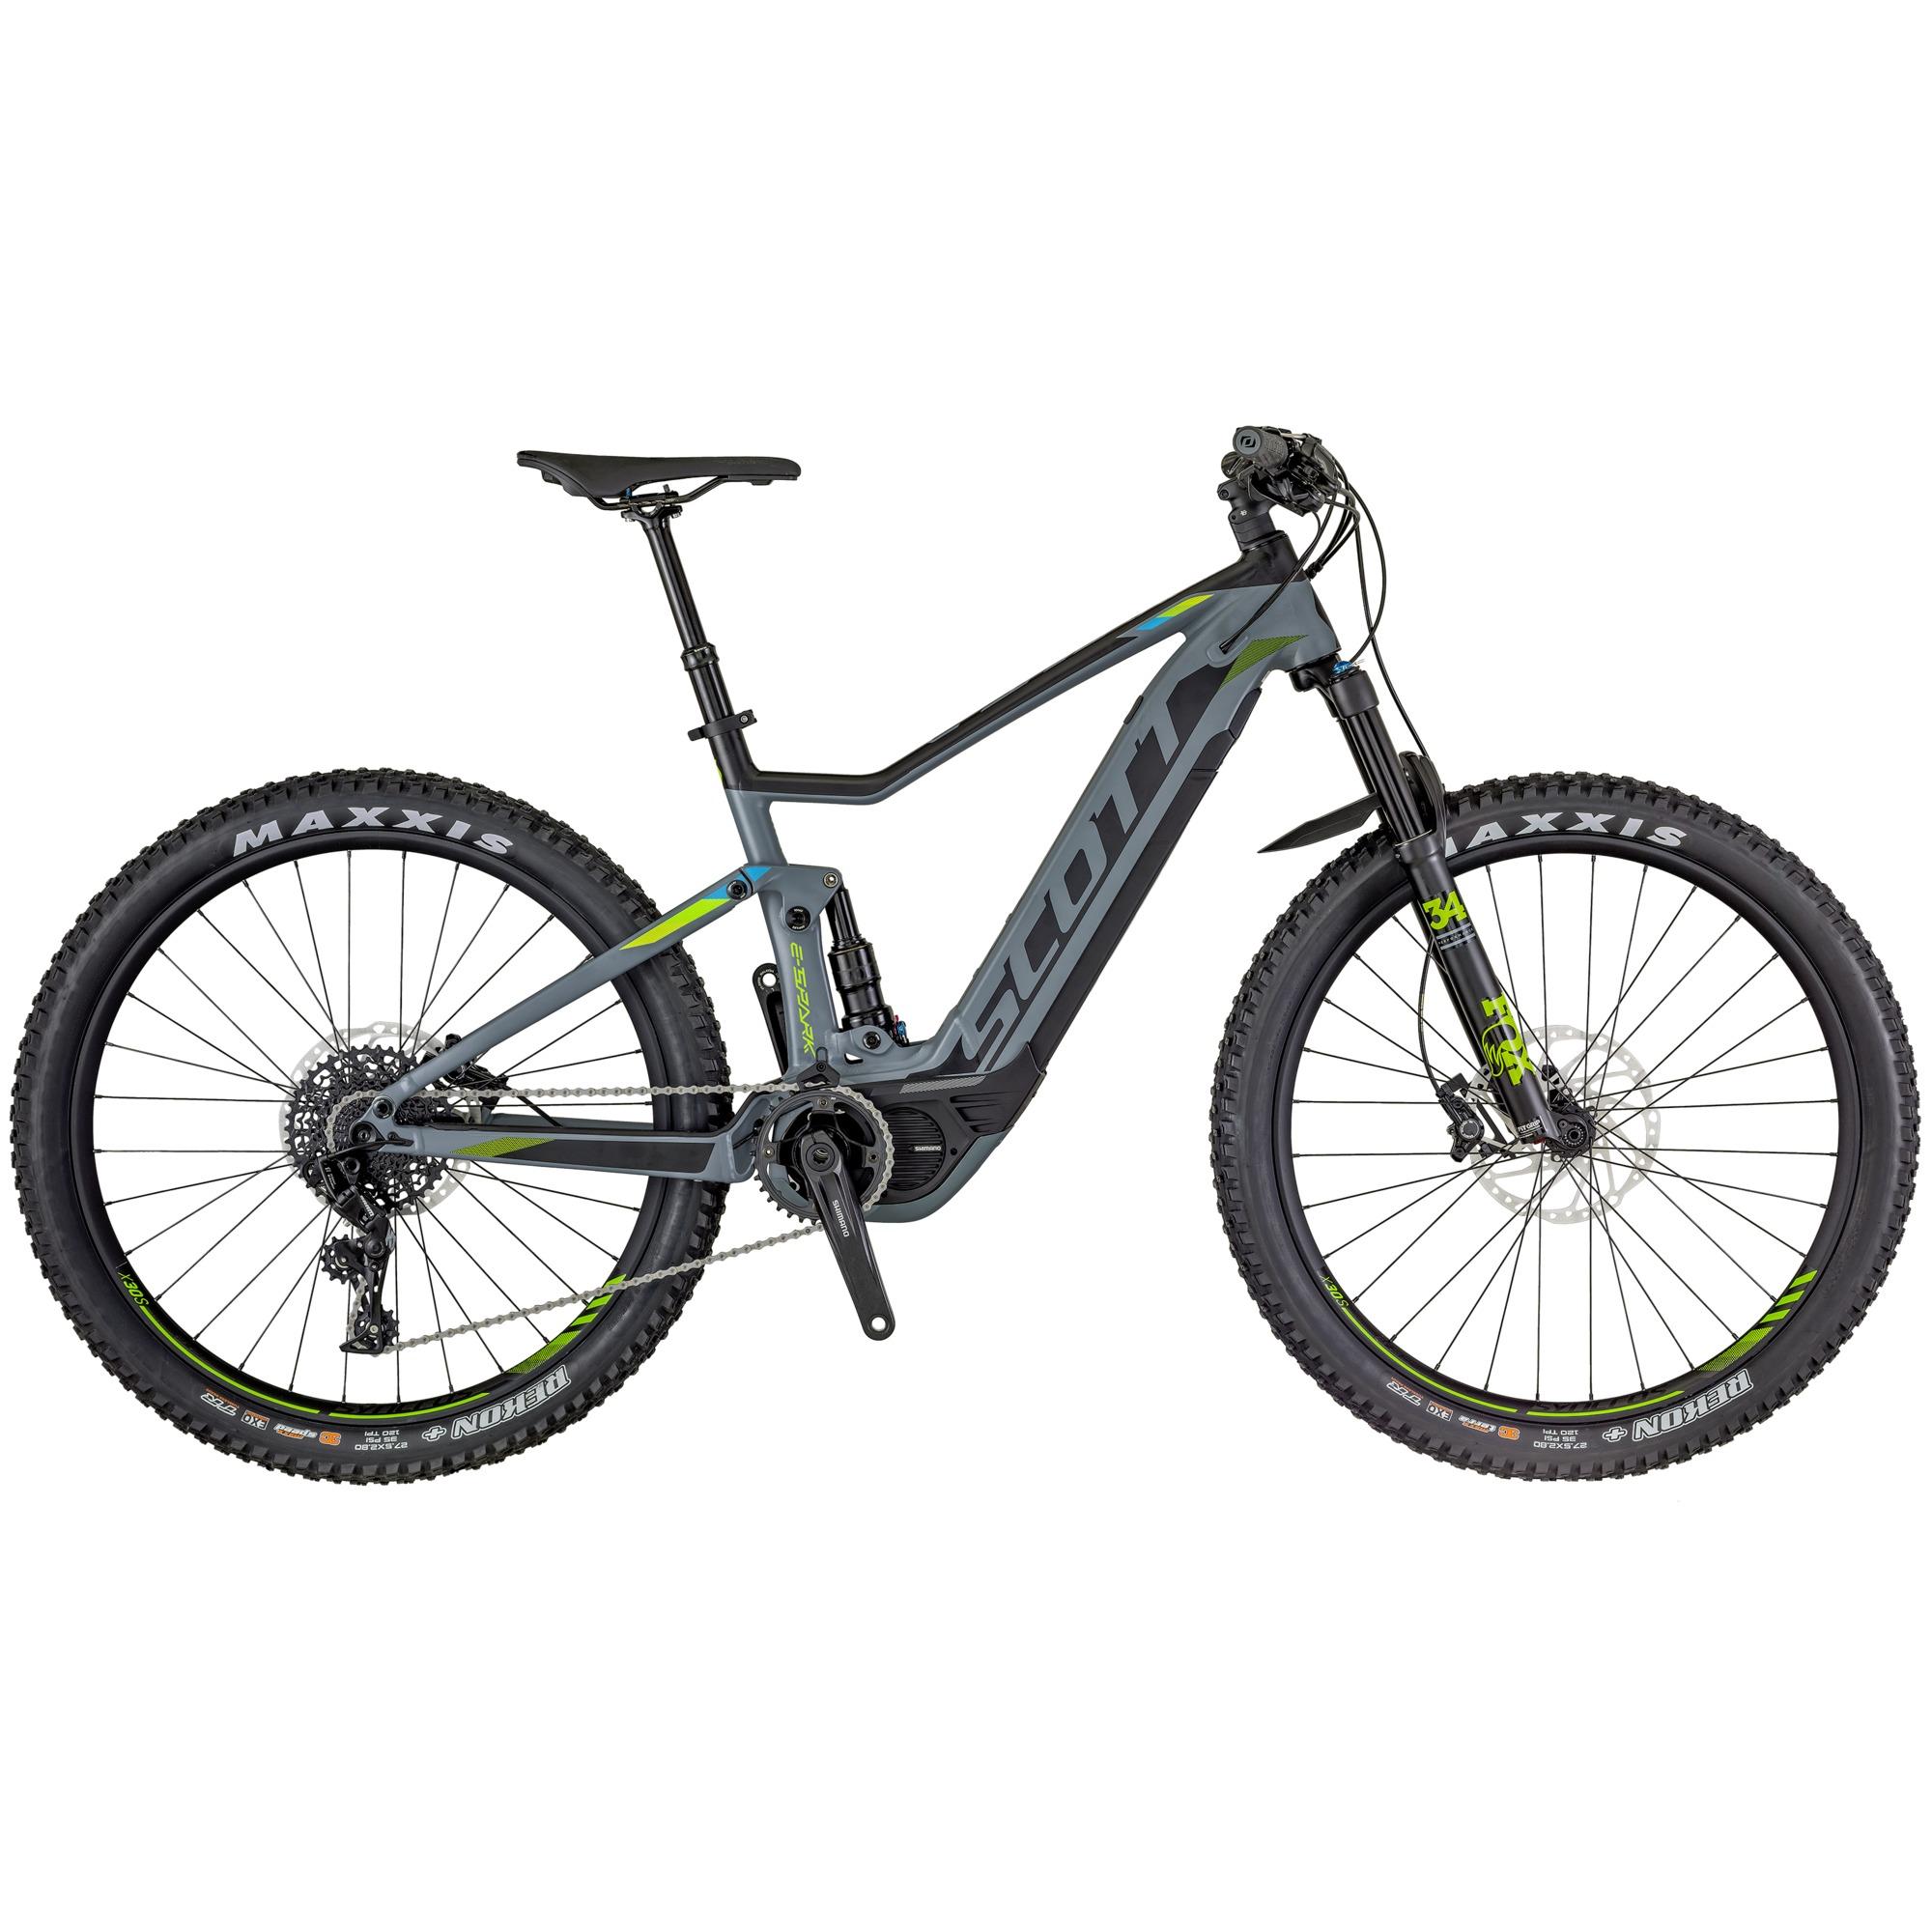 SCOTT E-Spark 720 Fahrrad L - Zweirad Homann